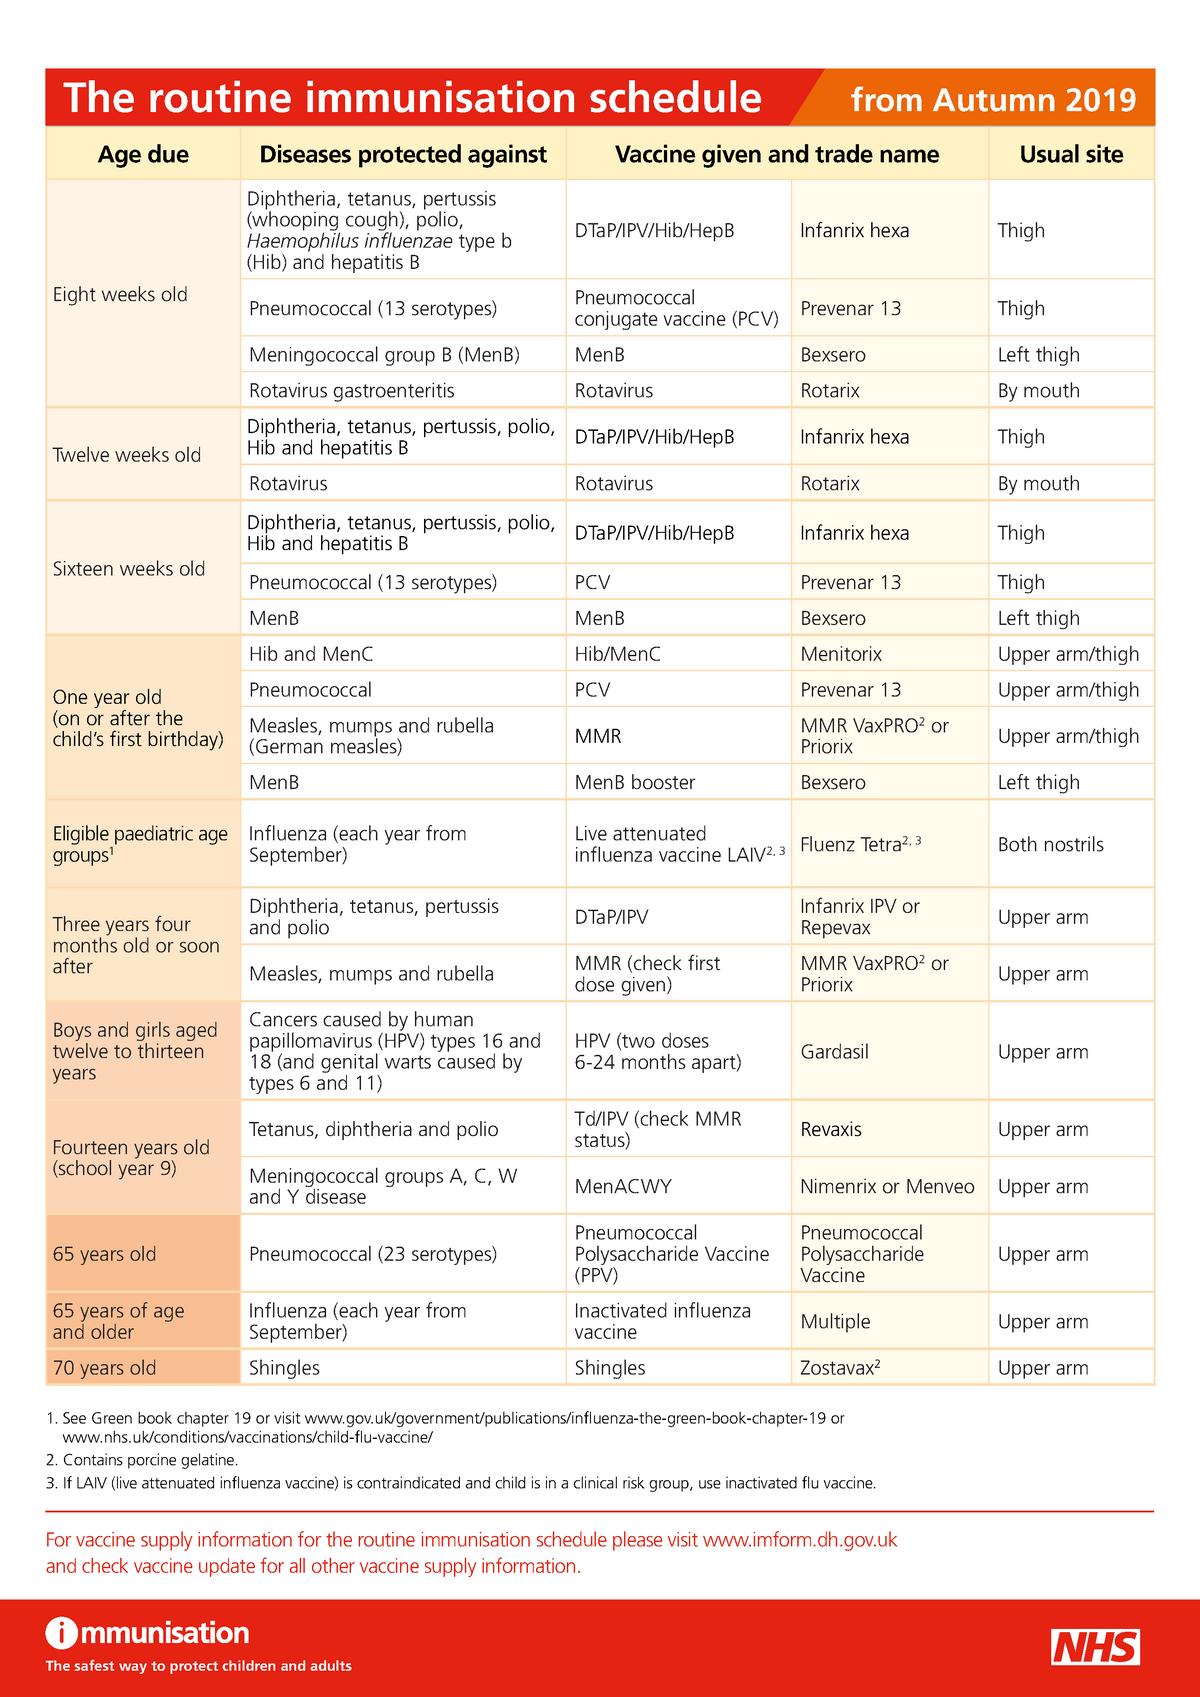 UK immunisation schedule - A100 - Cardiff - StuDocu